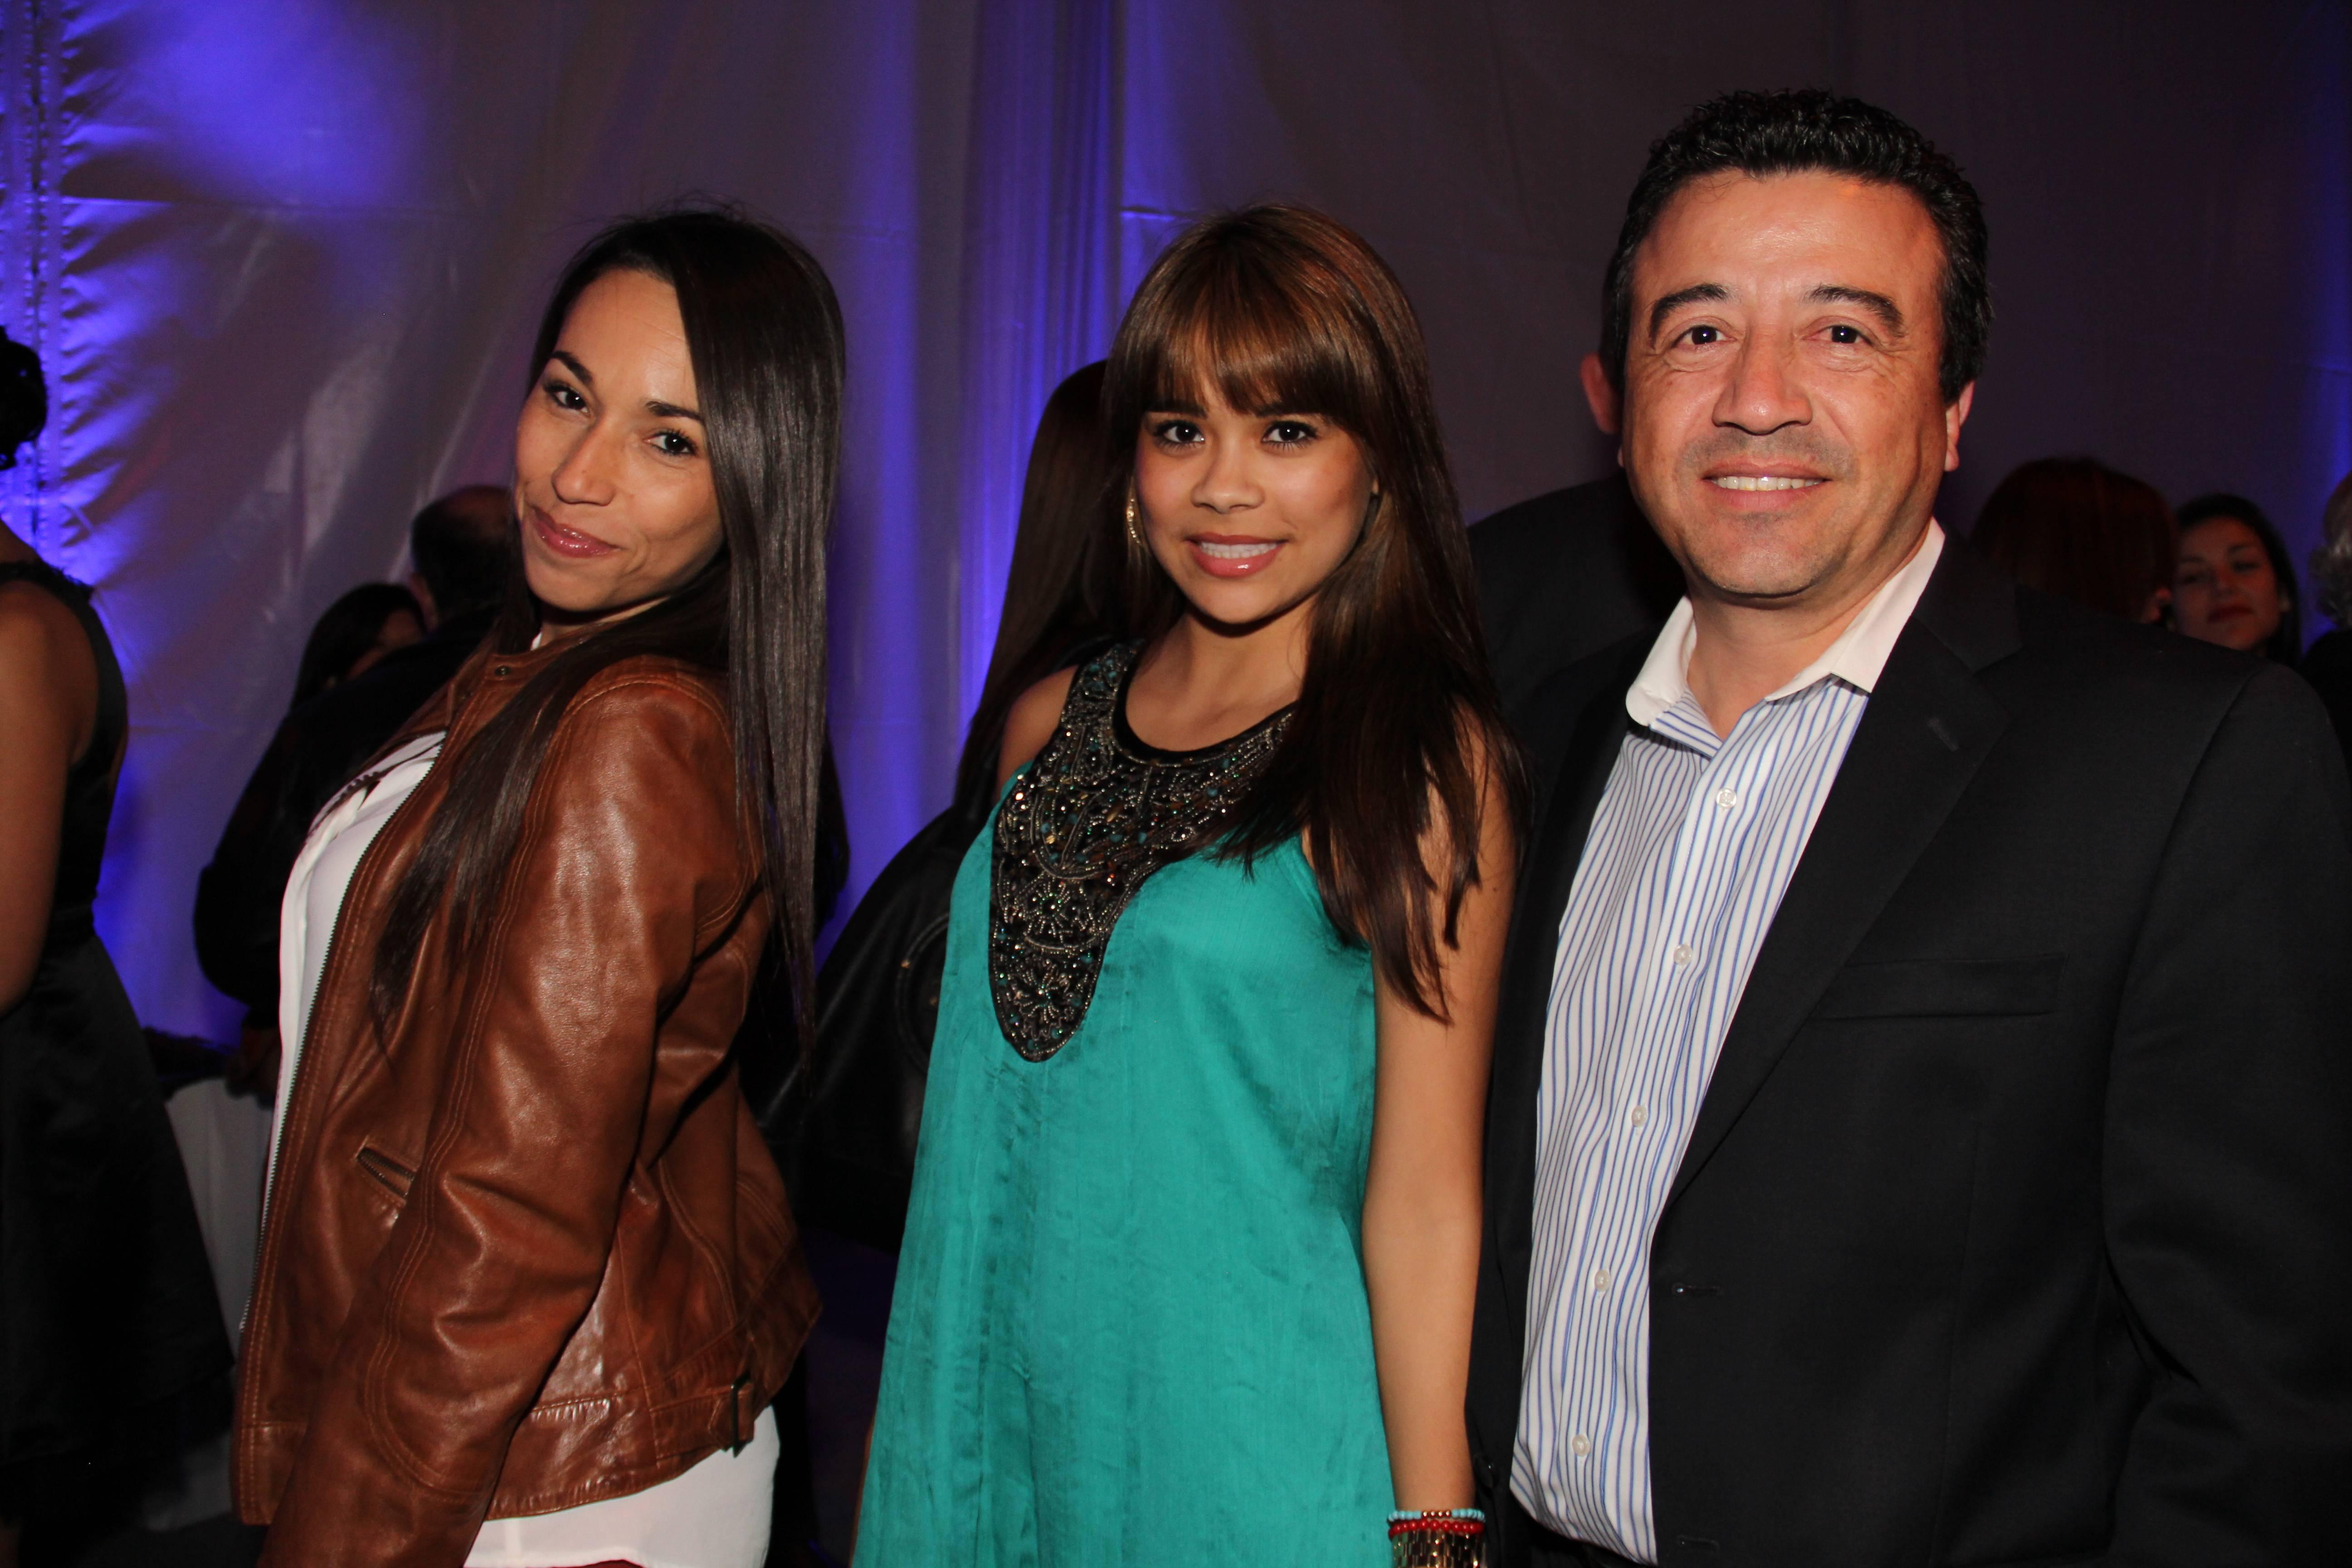 Ana Santos, Veronica Galiano, Pablo Rodriguez